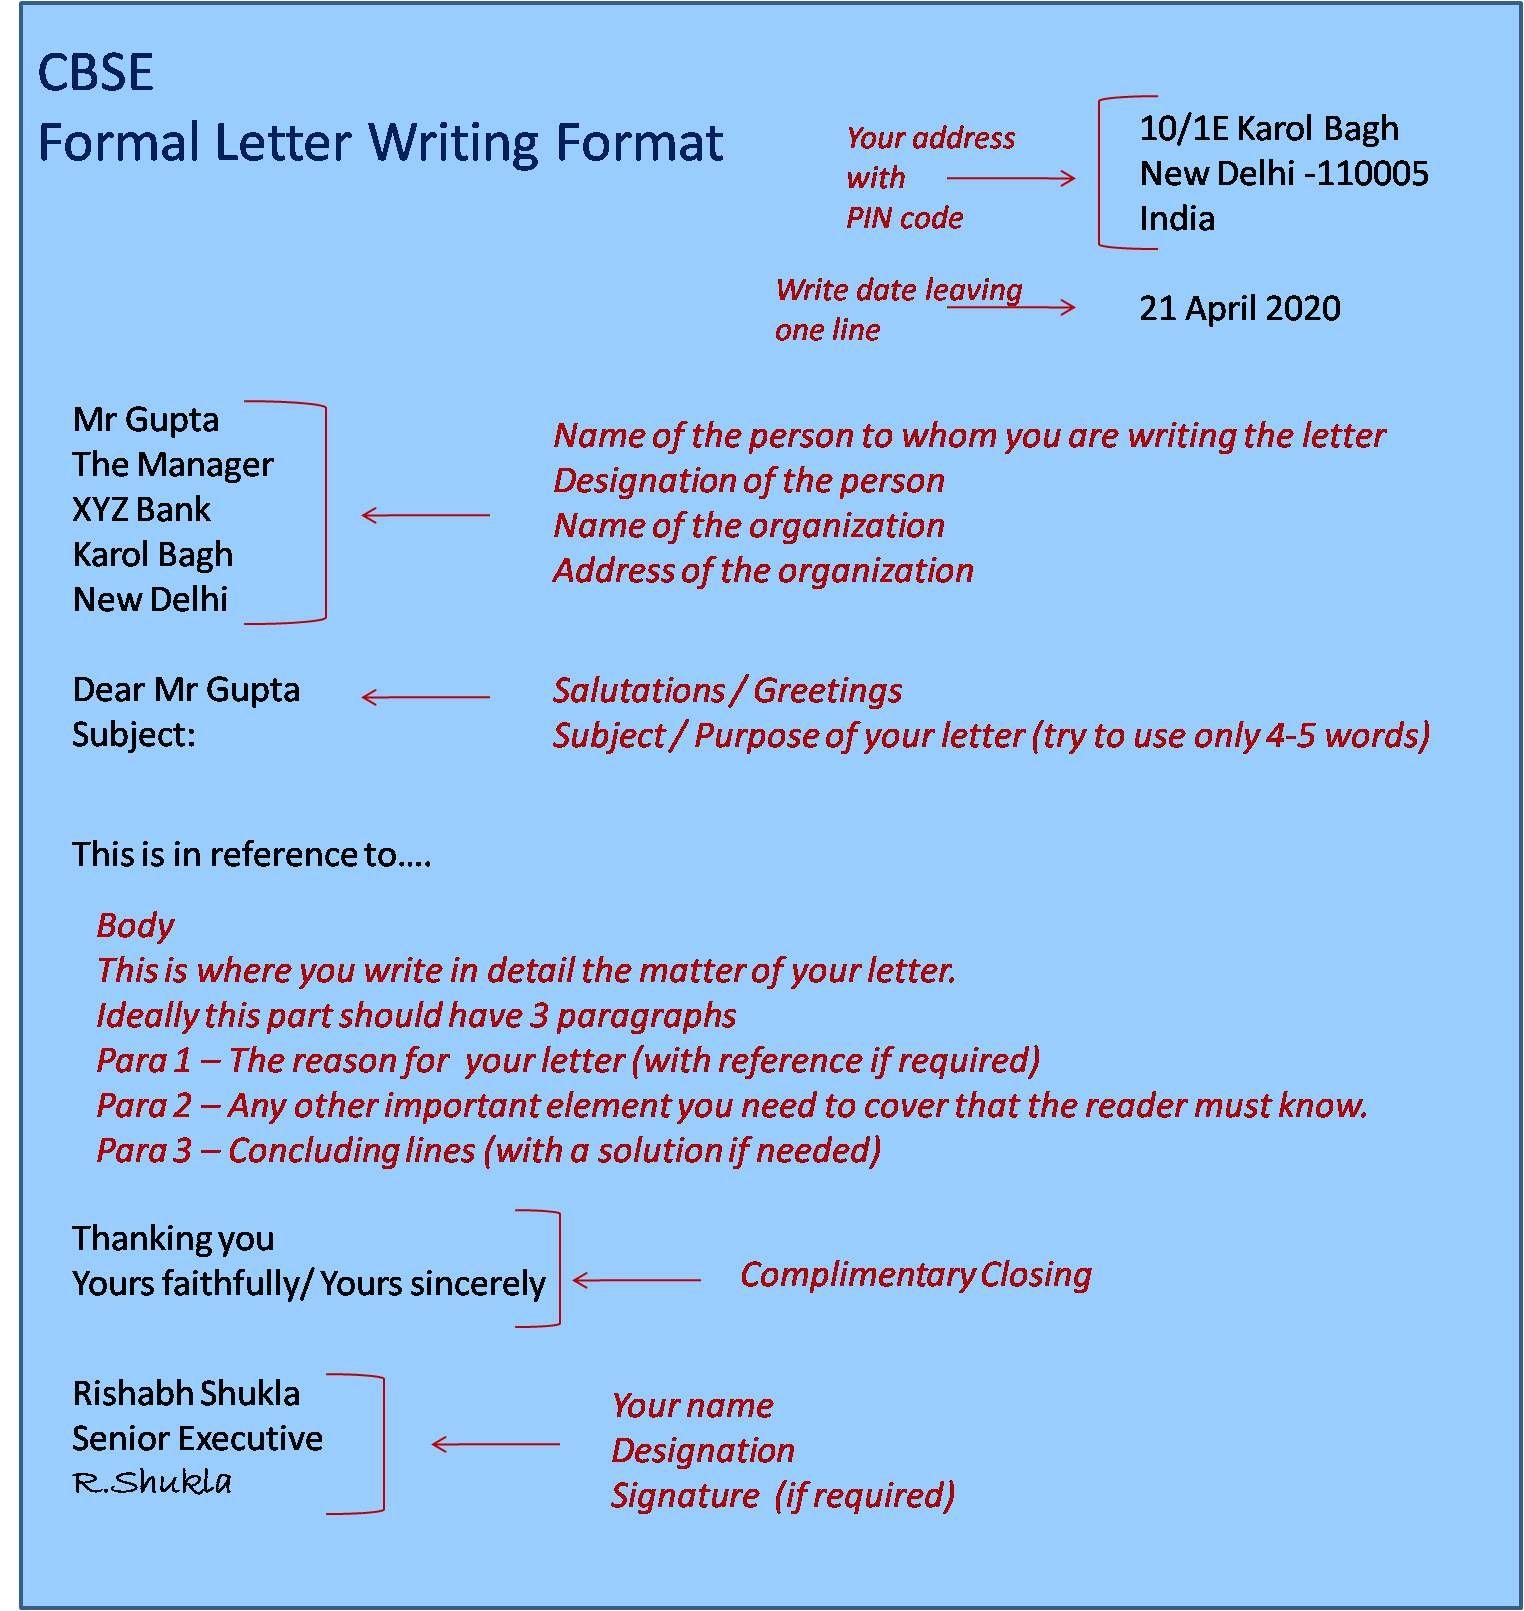 CBSE Formal Letter Format  Letter writing format, Formal letter